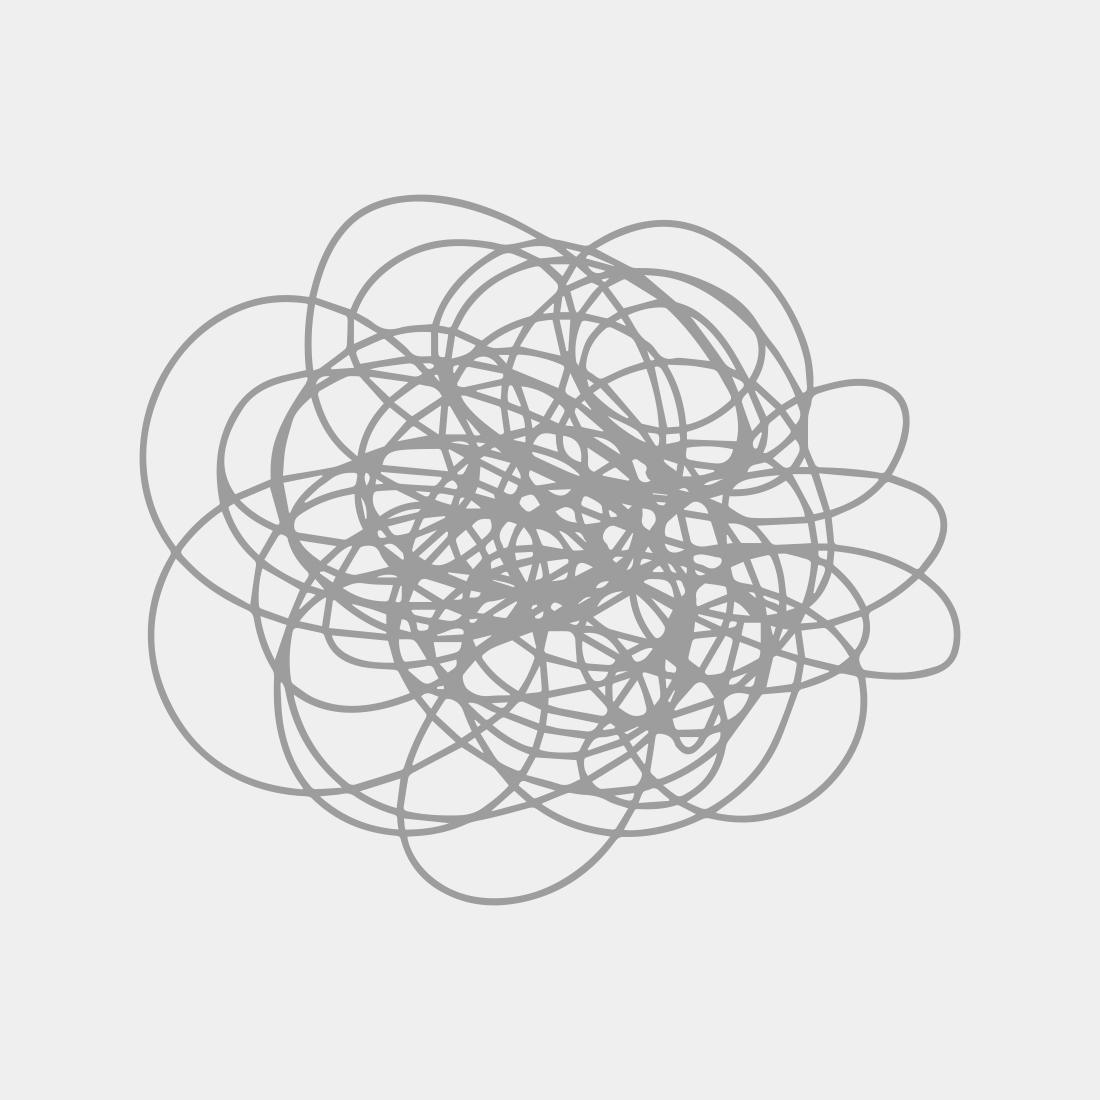 Barbara Rae Framed Print - Distant Achill